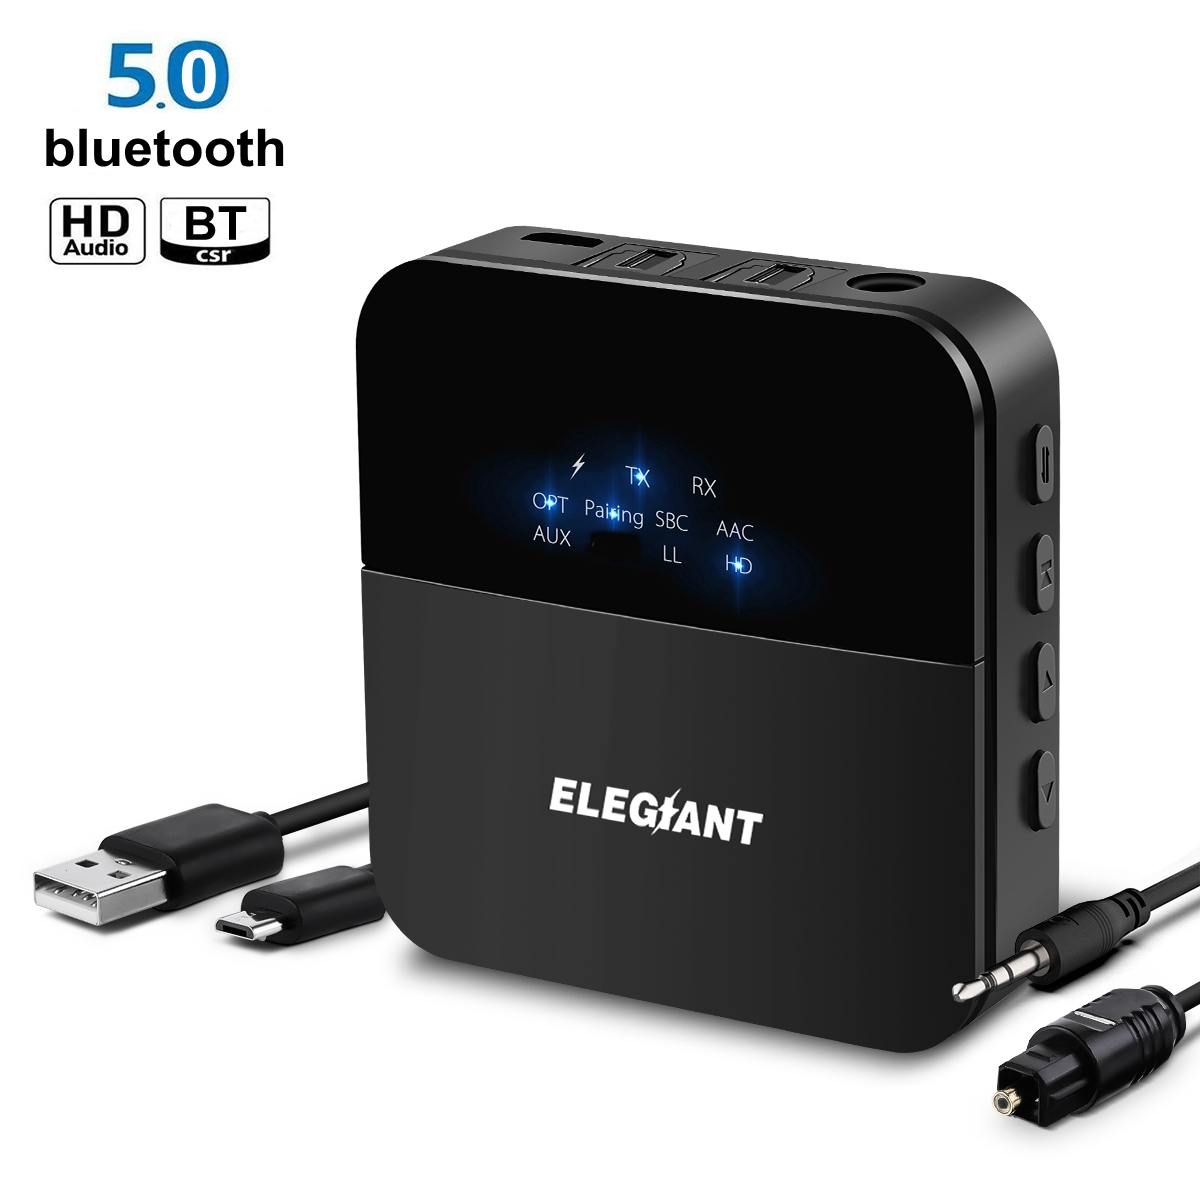 ELEGIANT 3.5mm 2RCA HD bluetooth 5.0 Audio Transmitter Receiver Wireless Adapter / AUX / LL / HiFi for Headphone Car